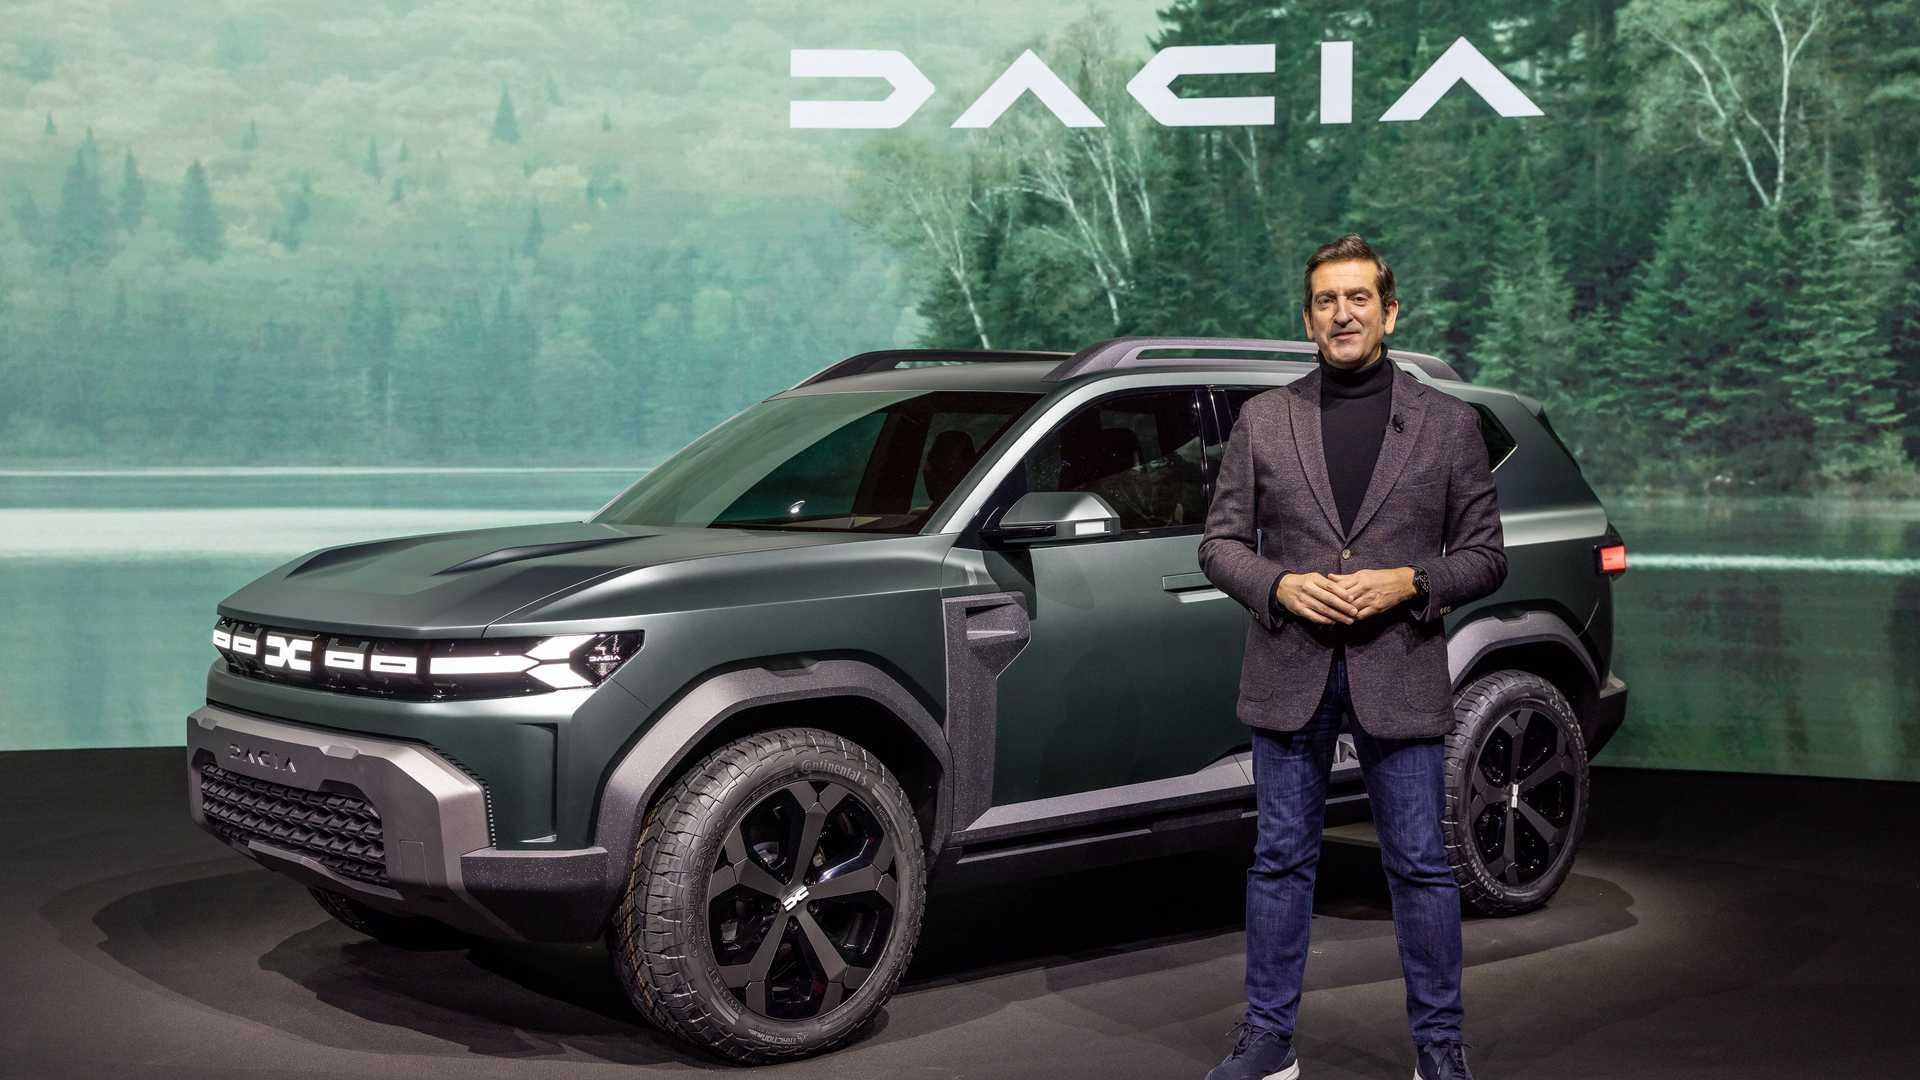 Dacia Bigster debiutuje jako koncept